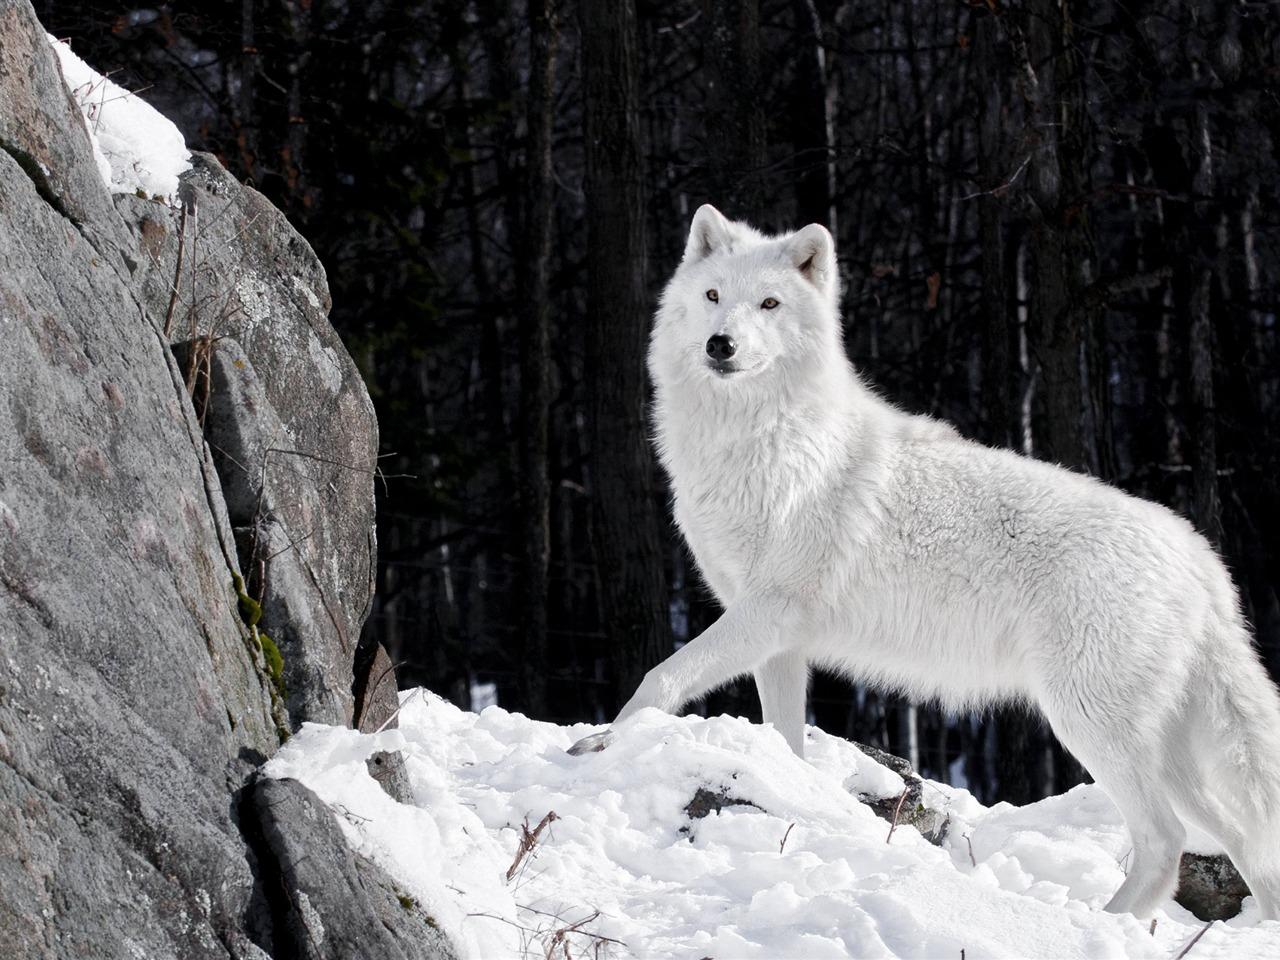 Wild Animal Wolf Wallpapers Hd 51074 Wallpaper: 美しい冬の森ホワイトウルフ-野生動物のHD壁紙プレビュー